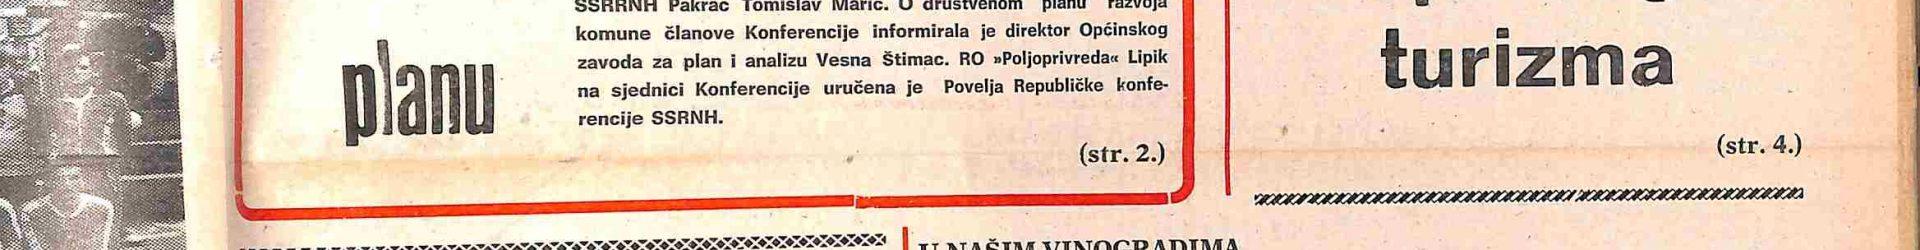 20 listopada 1981_Page_1